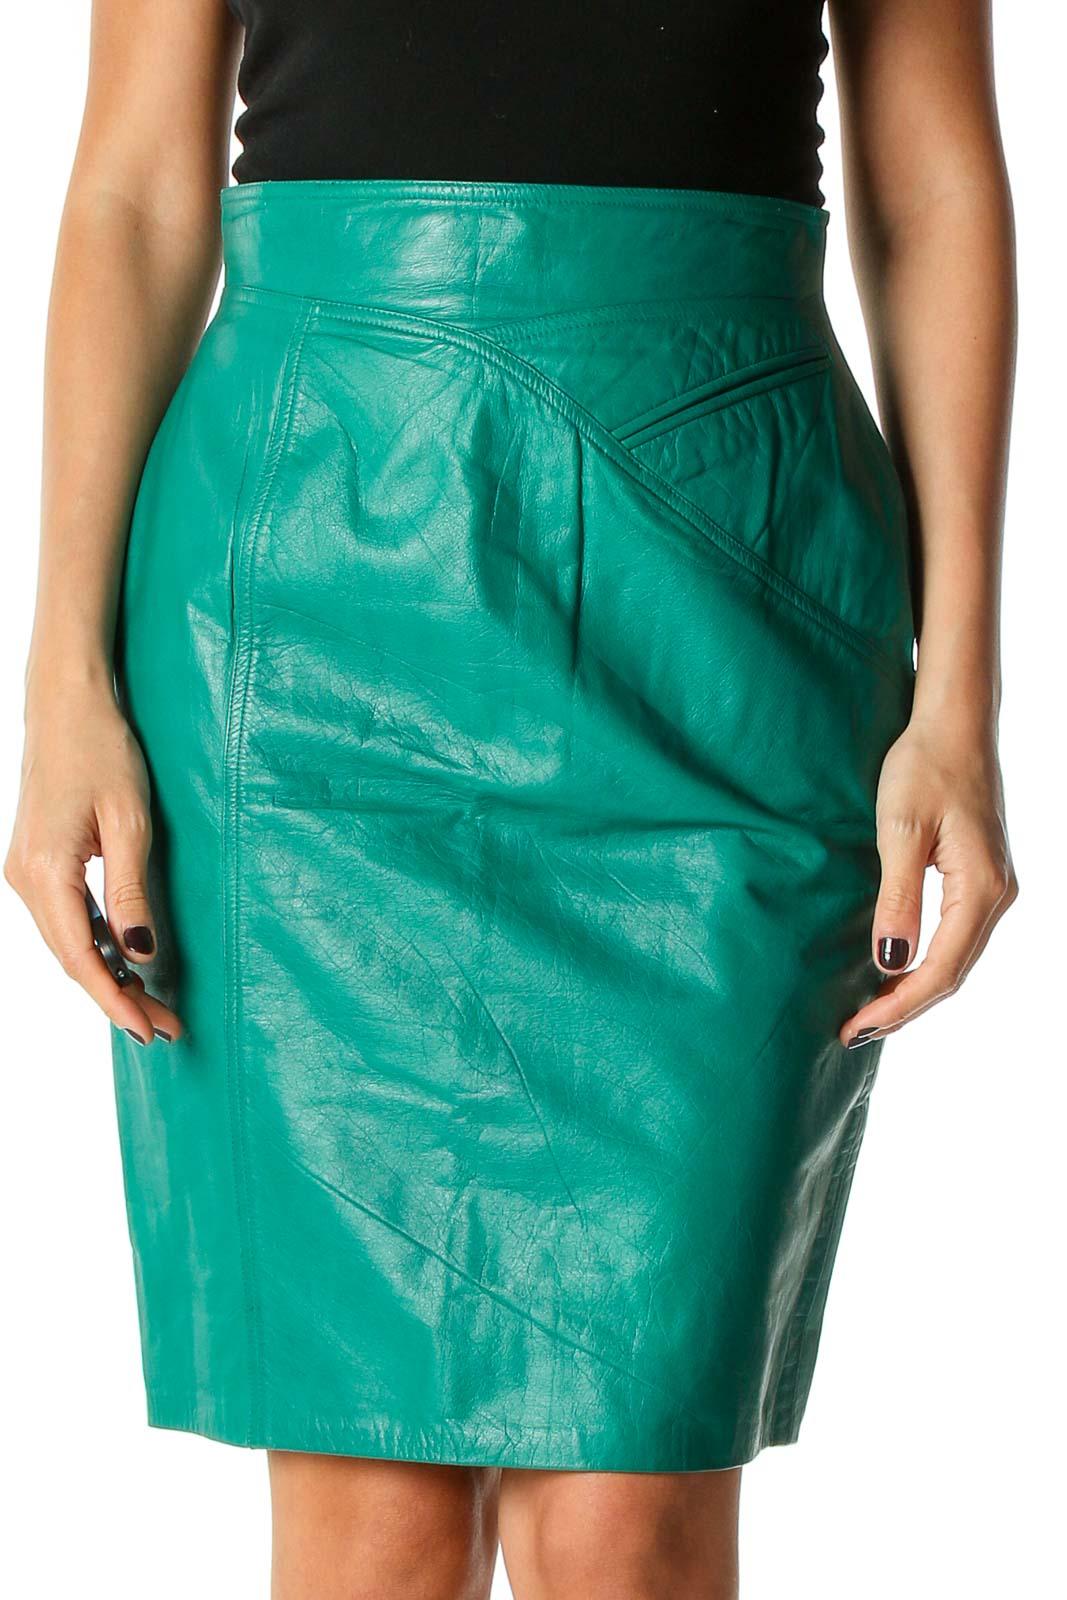 Green Colorblock Brunch Pencil Skirt Front